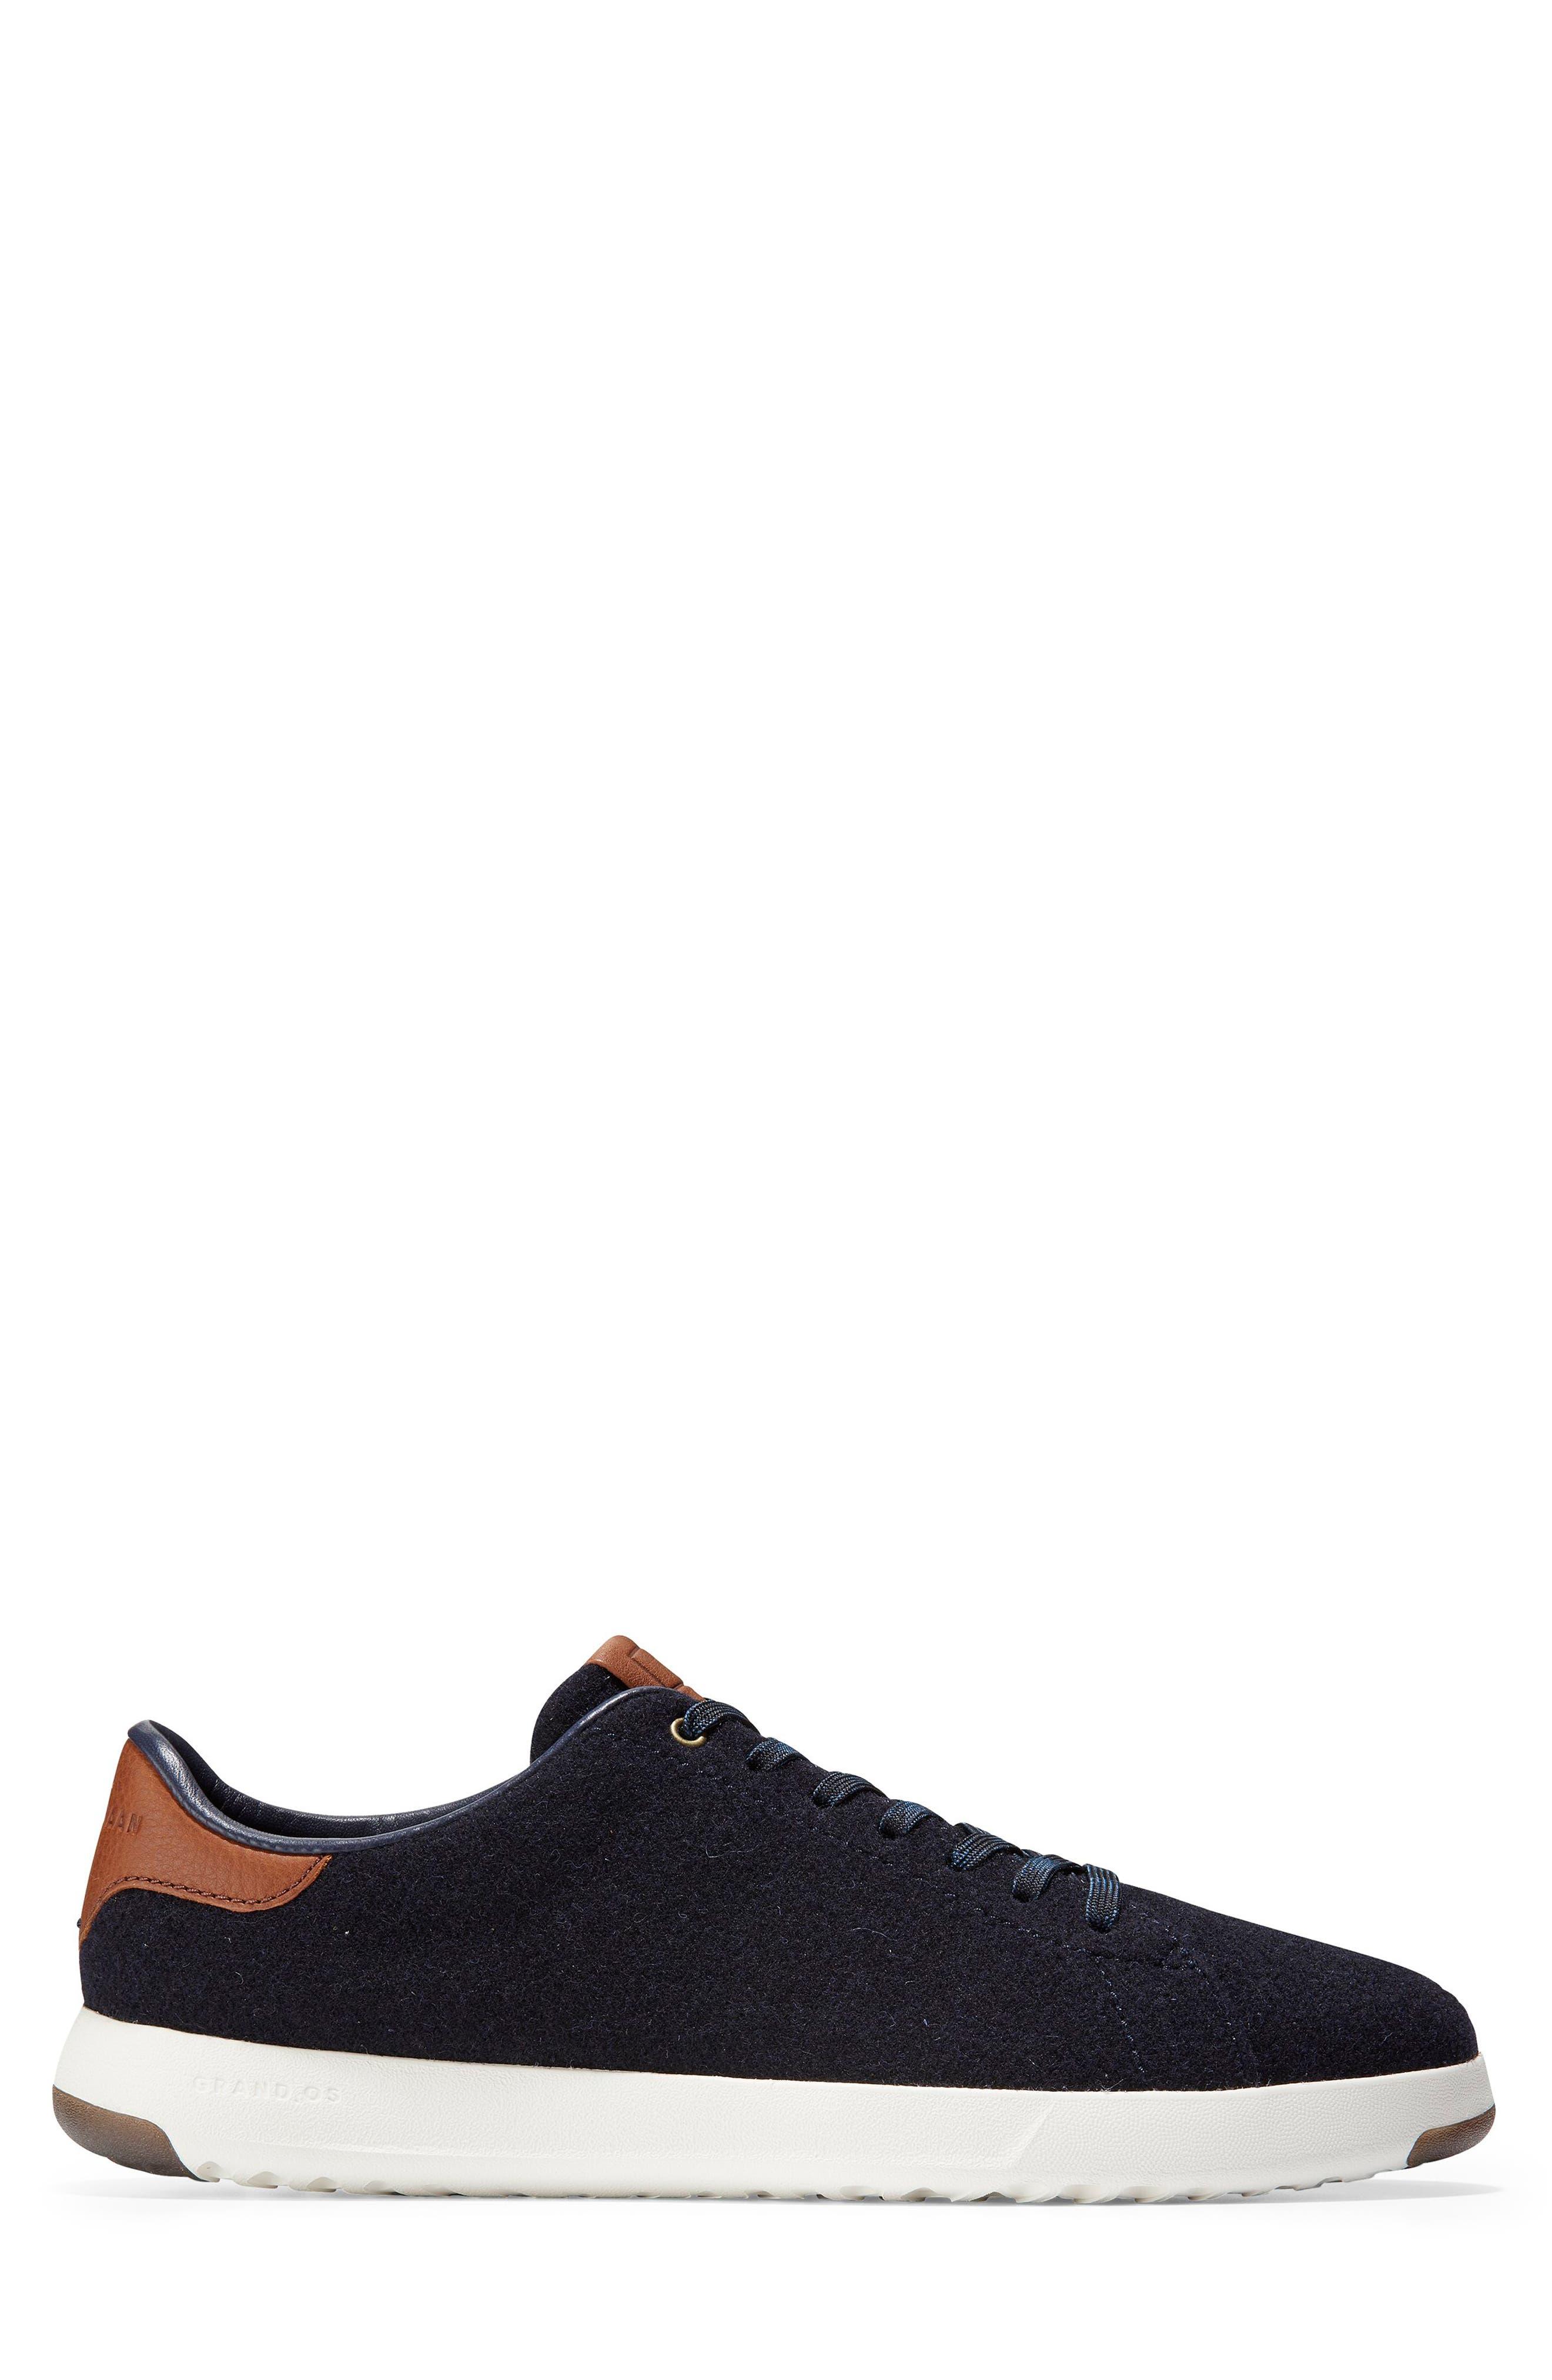 GrandPro Tennis Sneaker,                             Alternate thumbnail 3, color,                             NAVY INK WOOL/ BRITISH TAN